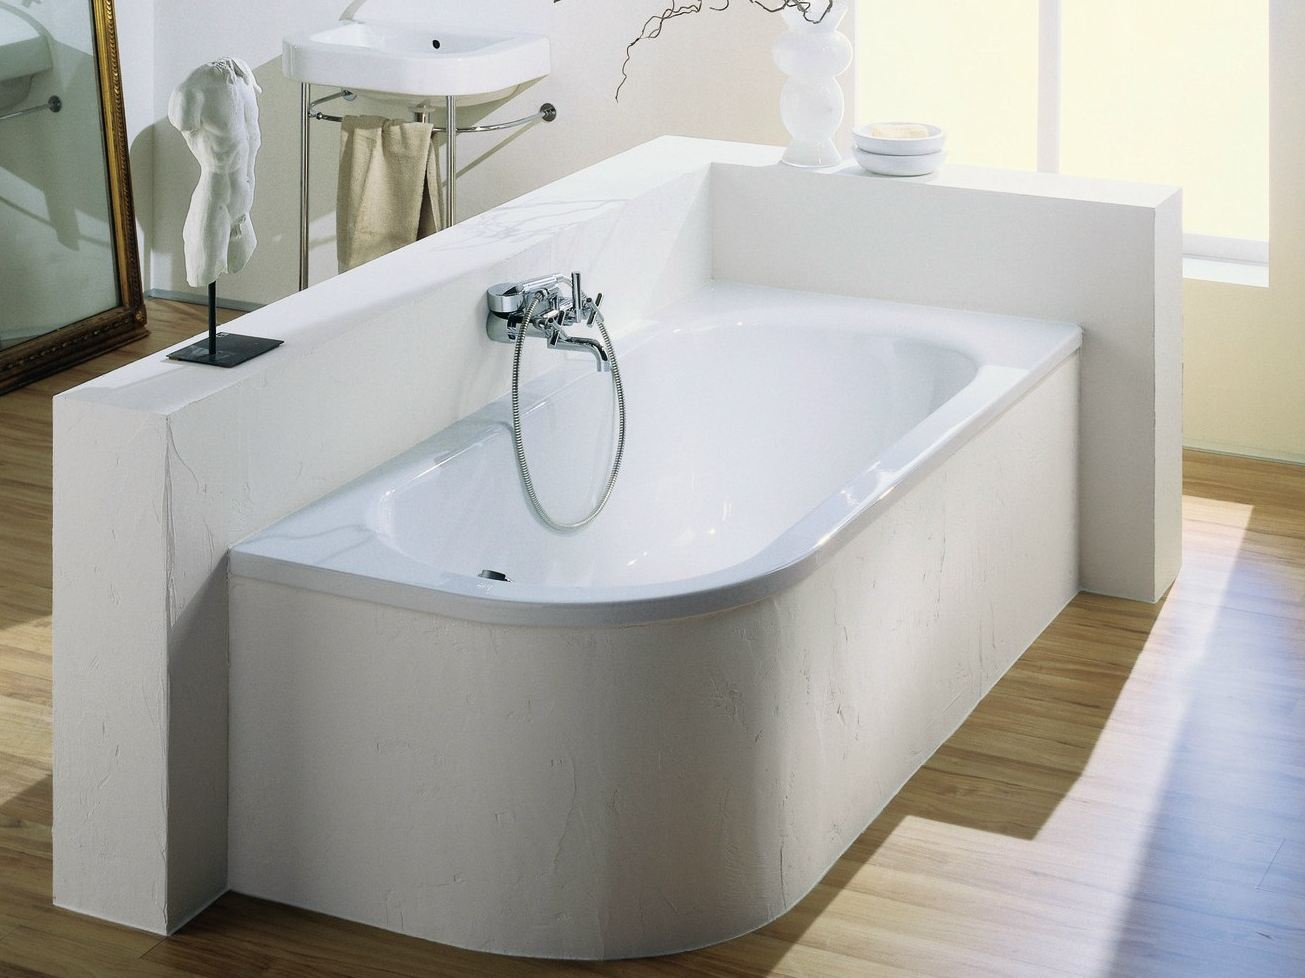 Vasche Da Bagno Angolari Piccole : Vasche da bagno piccole. trendy latest vasche da bagno di lusso with